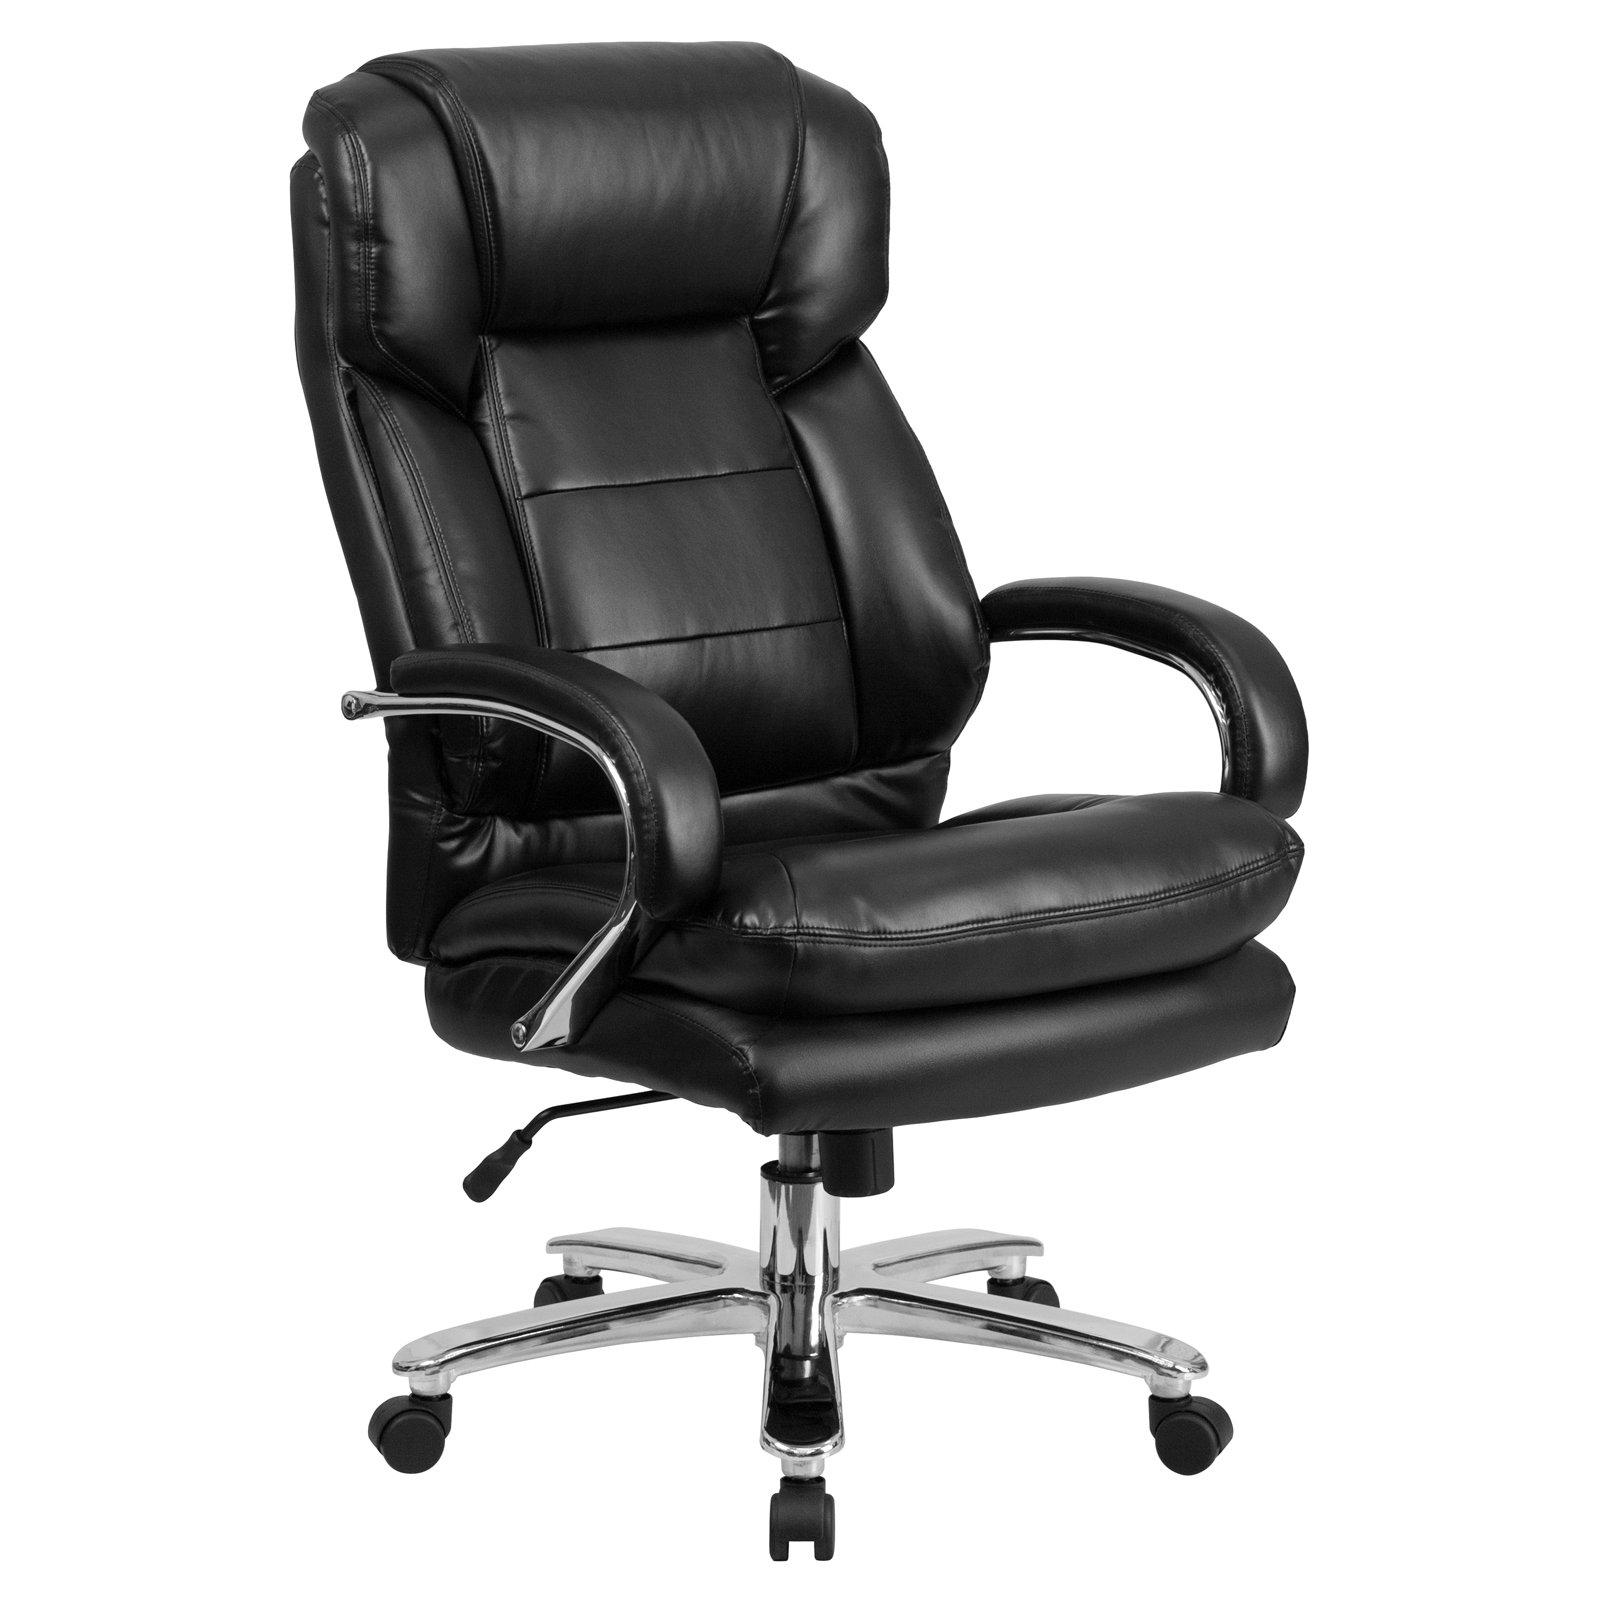 xl desk chair chivari rental big tall office chairs flash furniture hercules 500 pound capacity